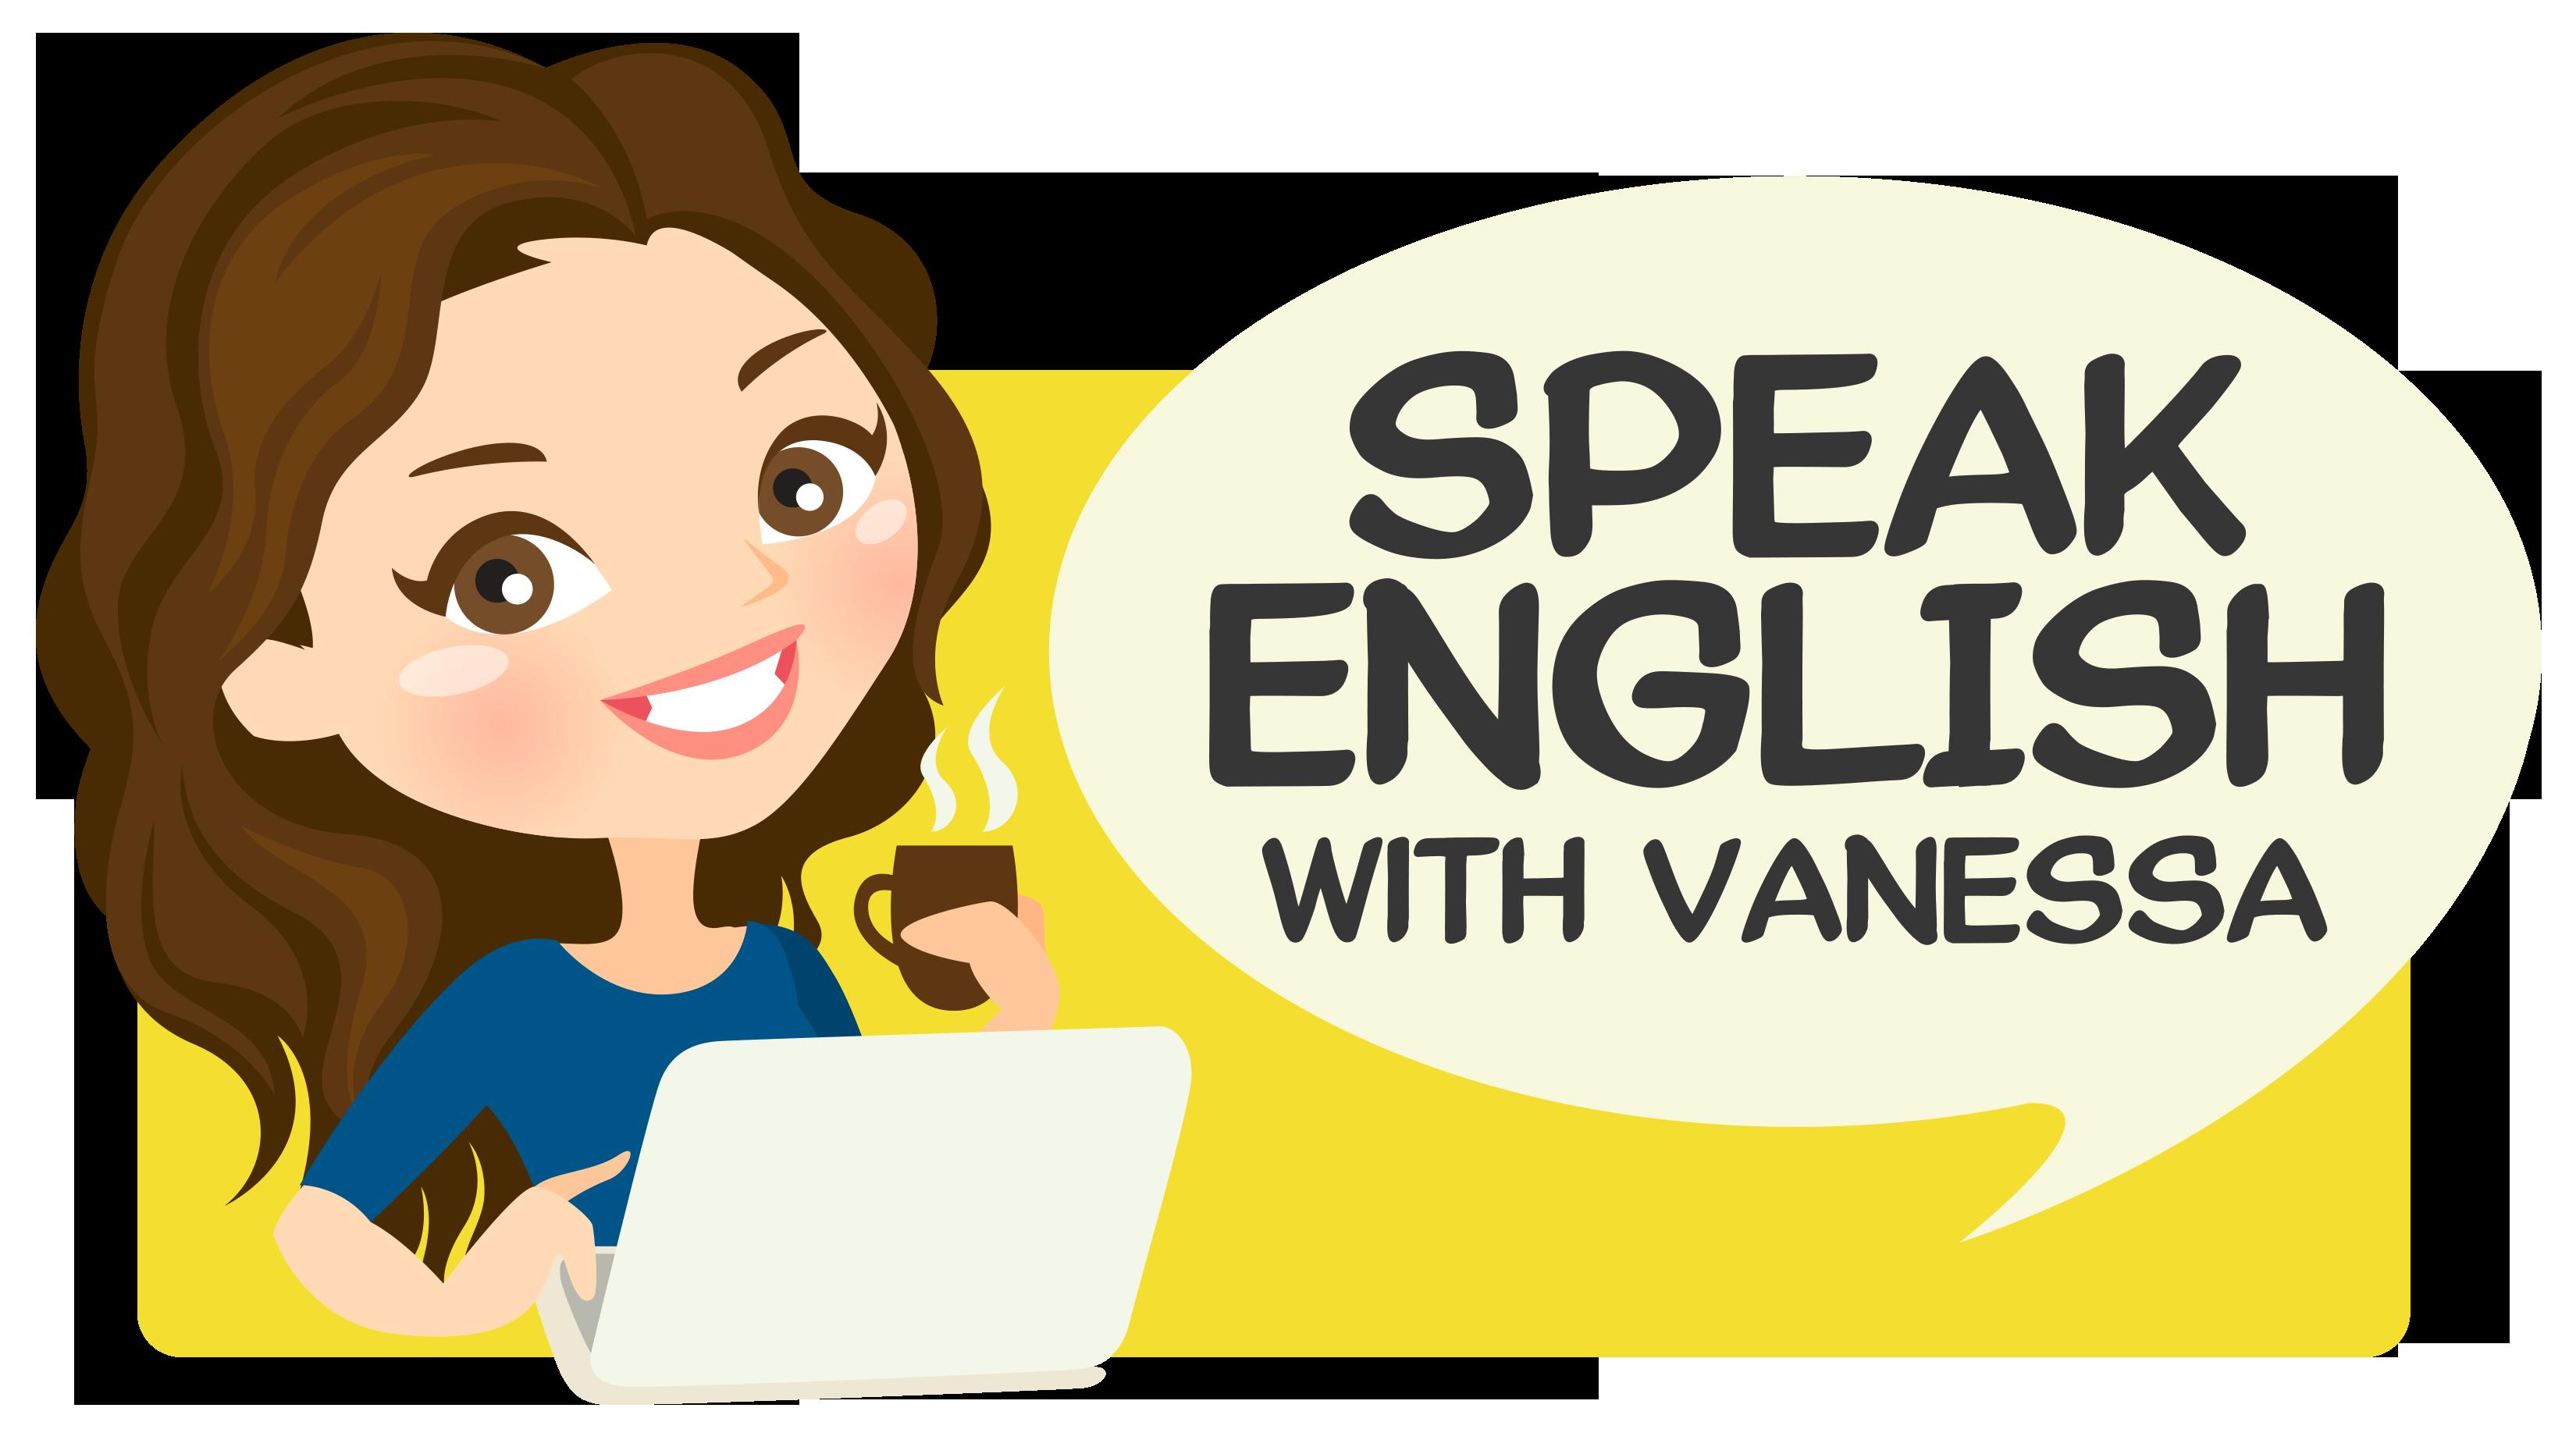 Speak English With Vanessa - Pick And Speak PNG